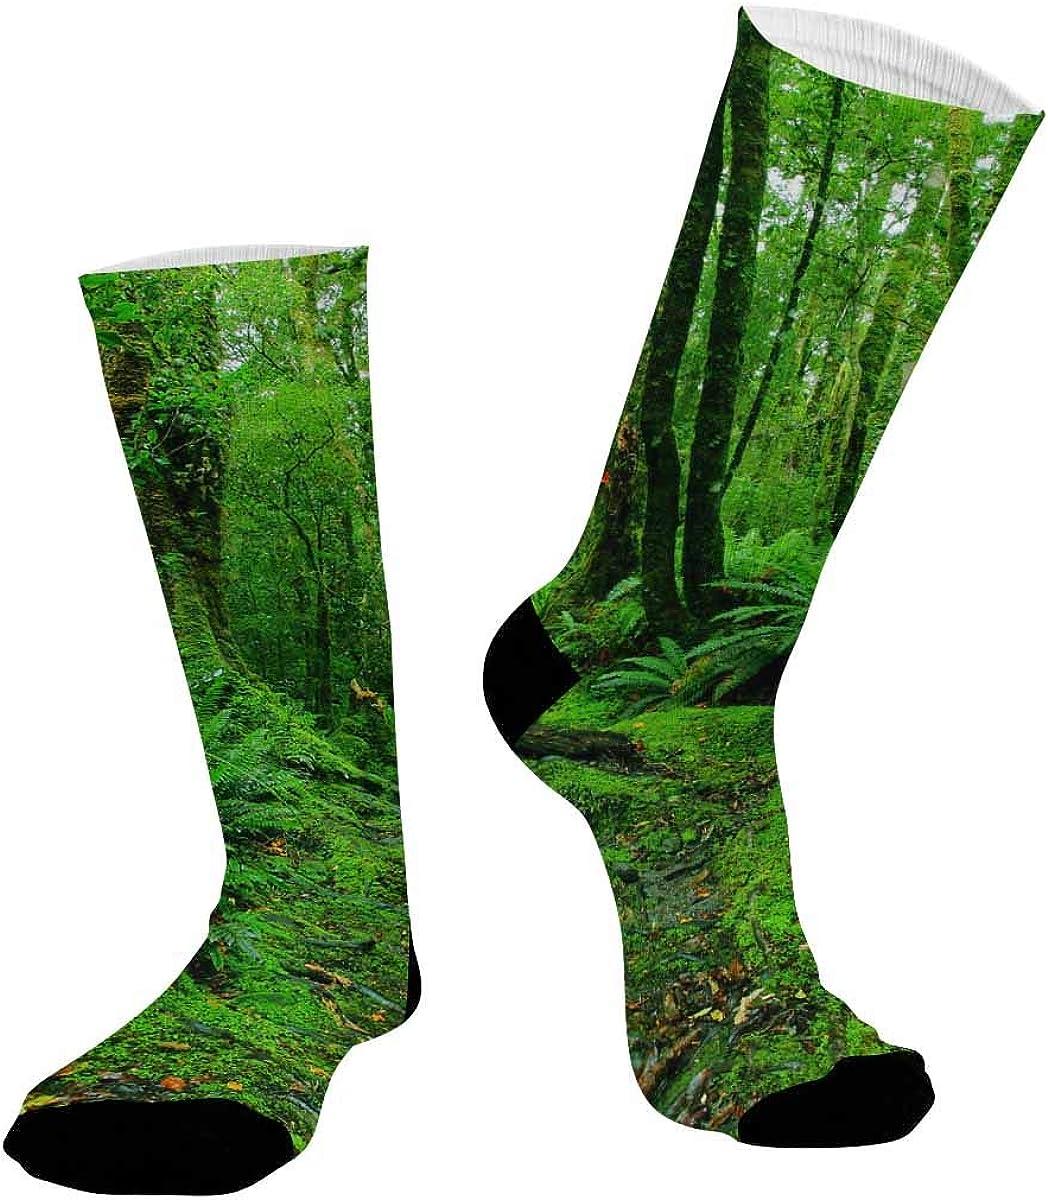 INTERESTPRINT Unisex Athletic Comfort Sublimated Crew Socks Rainforest Path